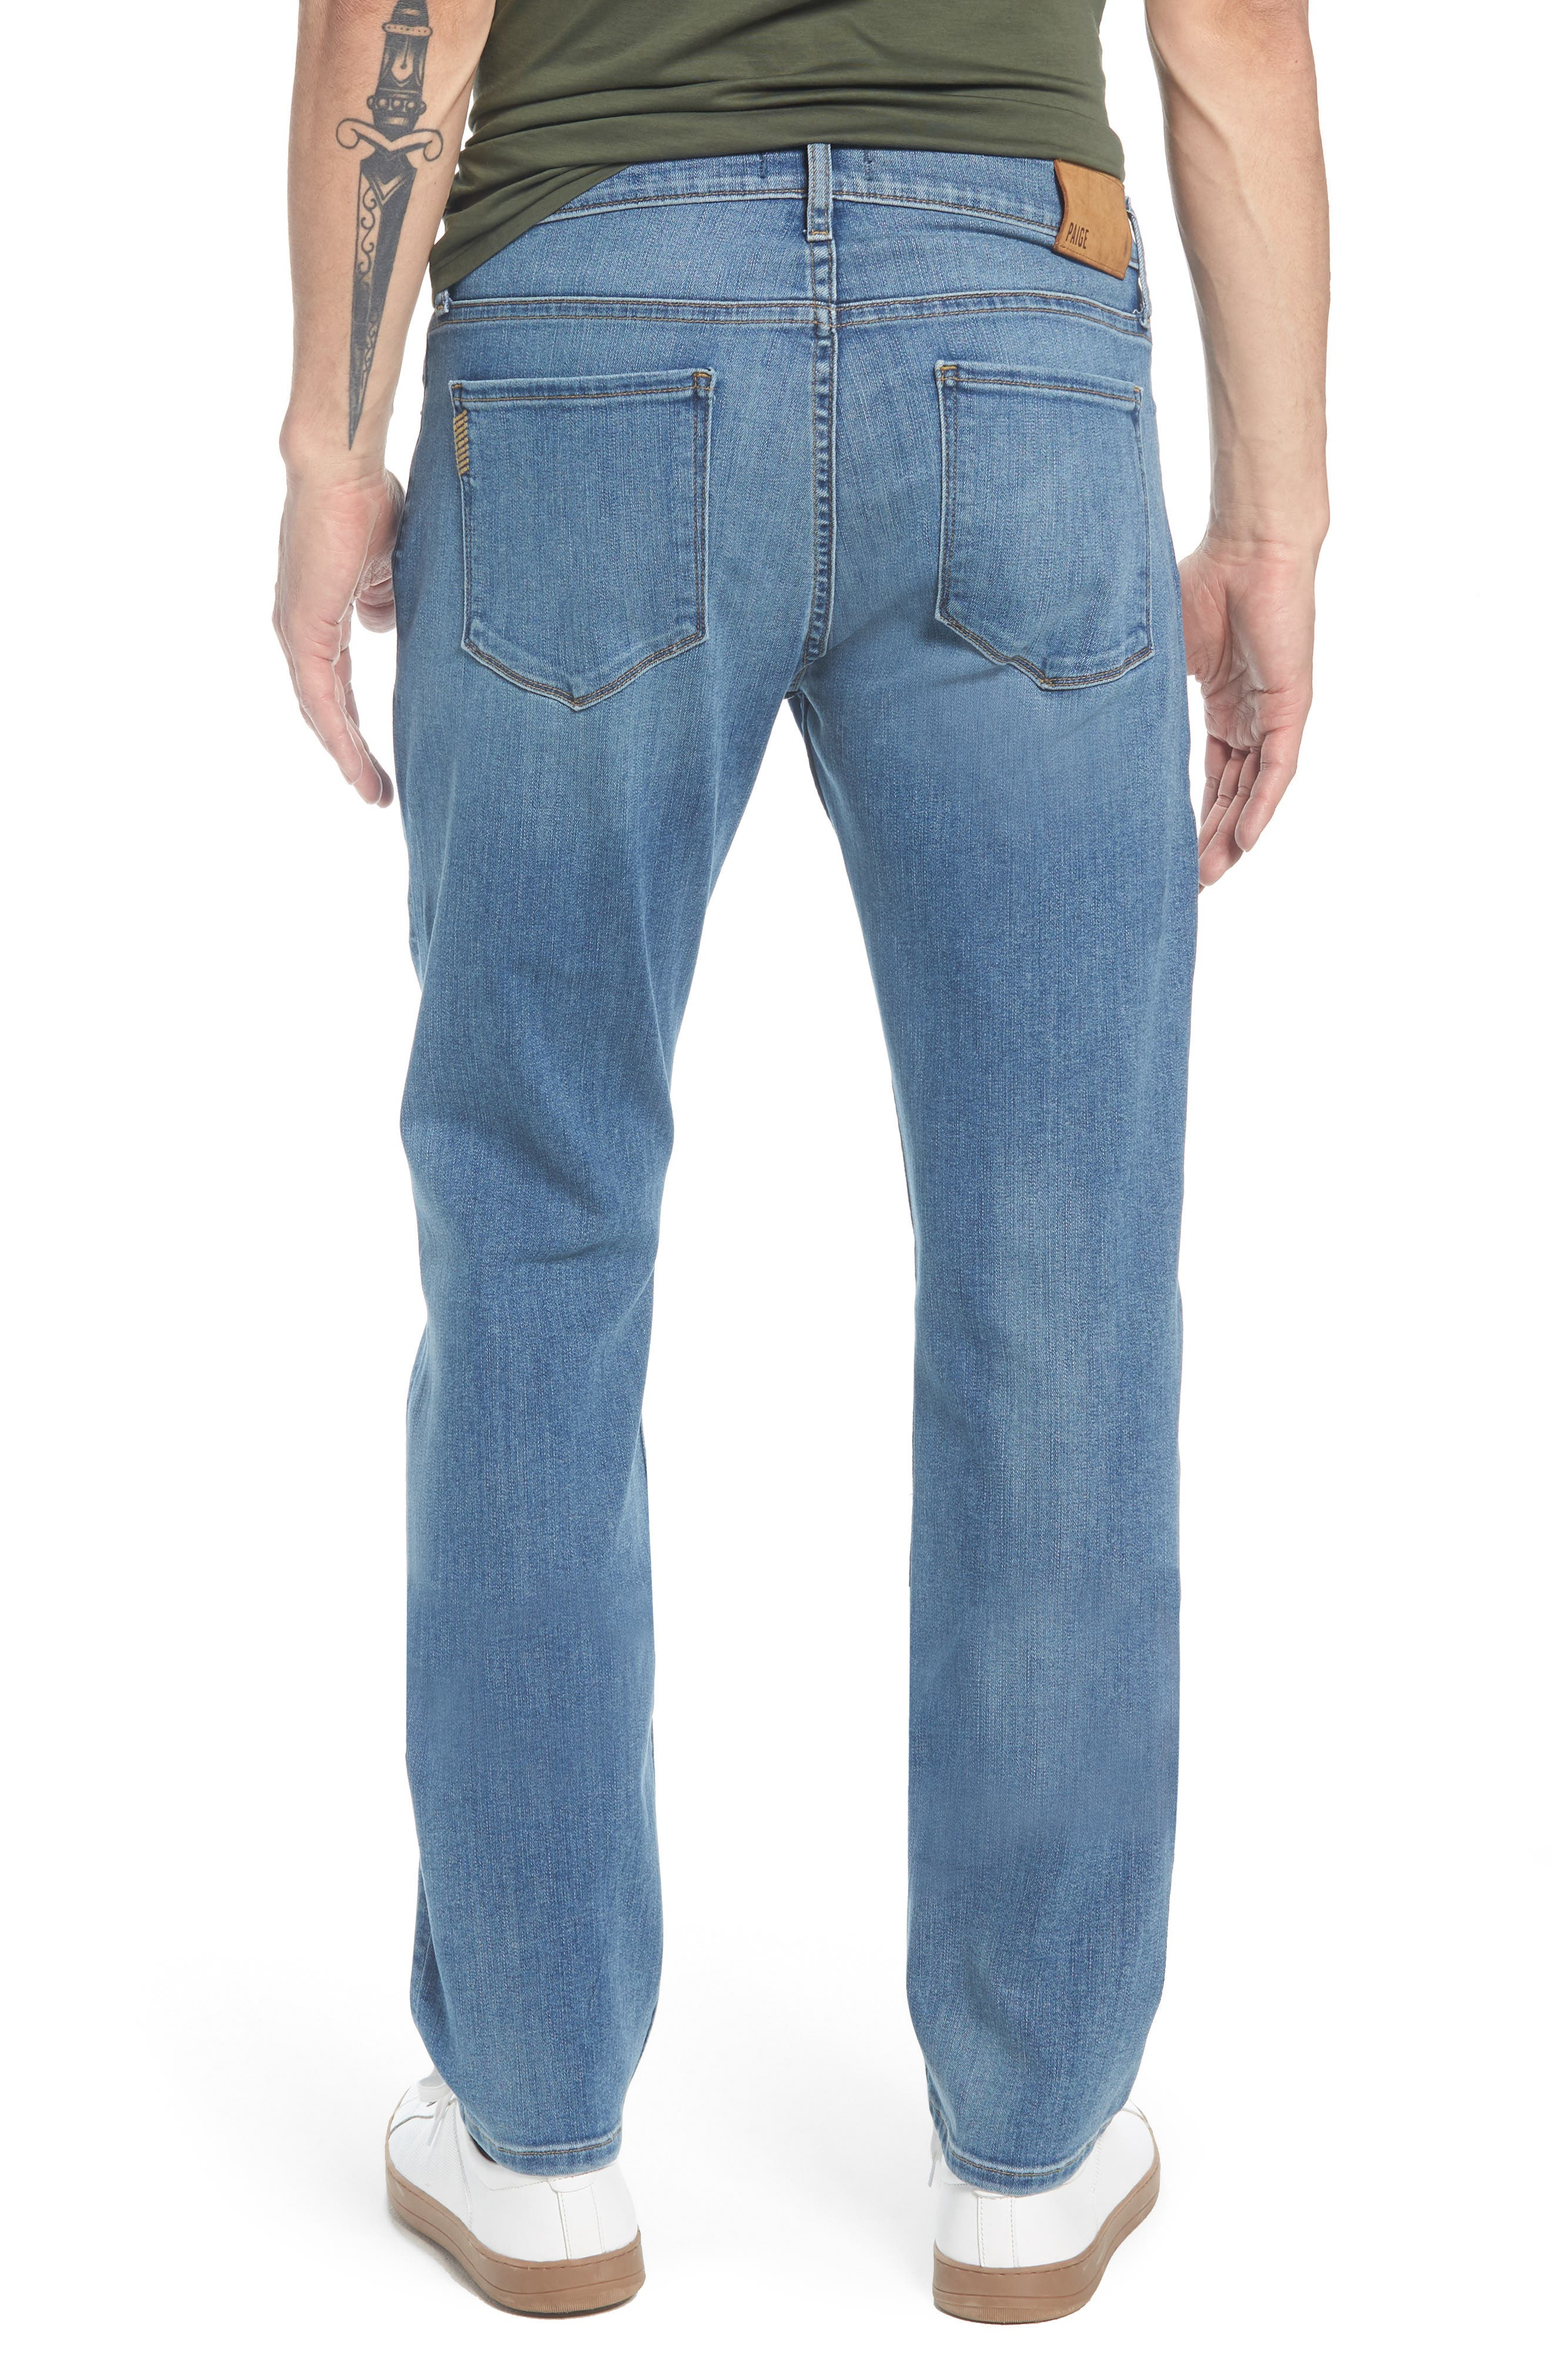 PAIGE,                             Federal Slim Straight Leg Jeans,                             Alternate thumbnail 2, color,                             400